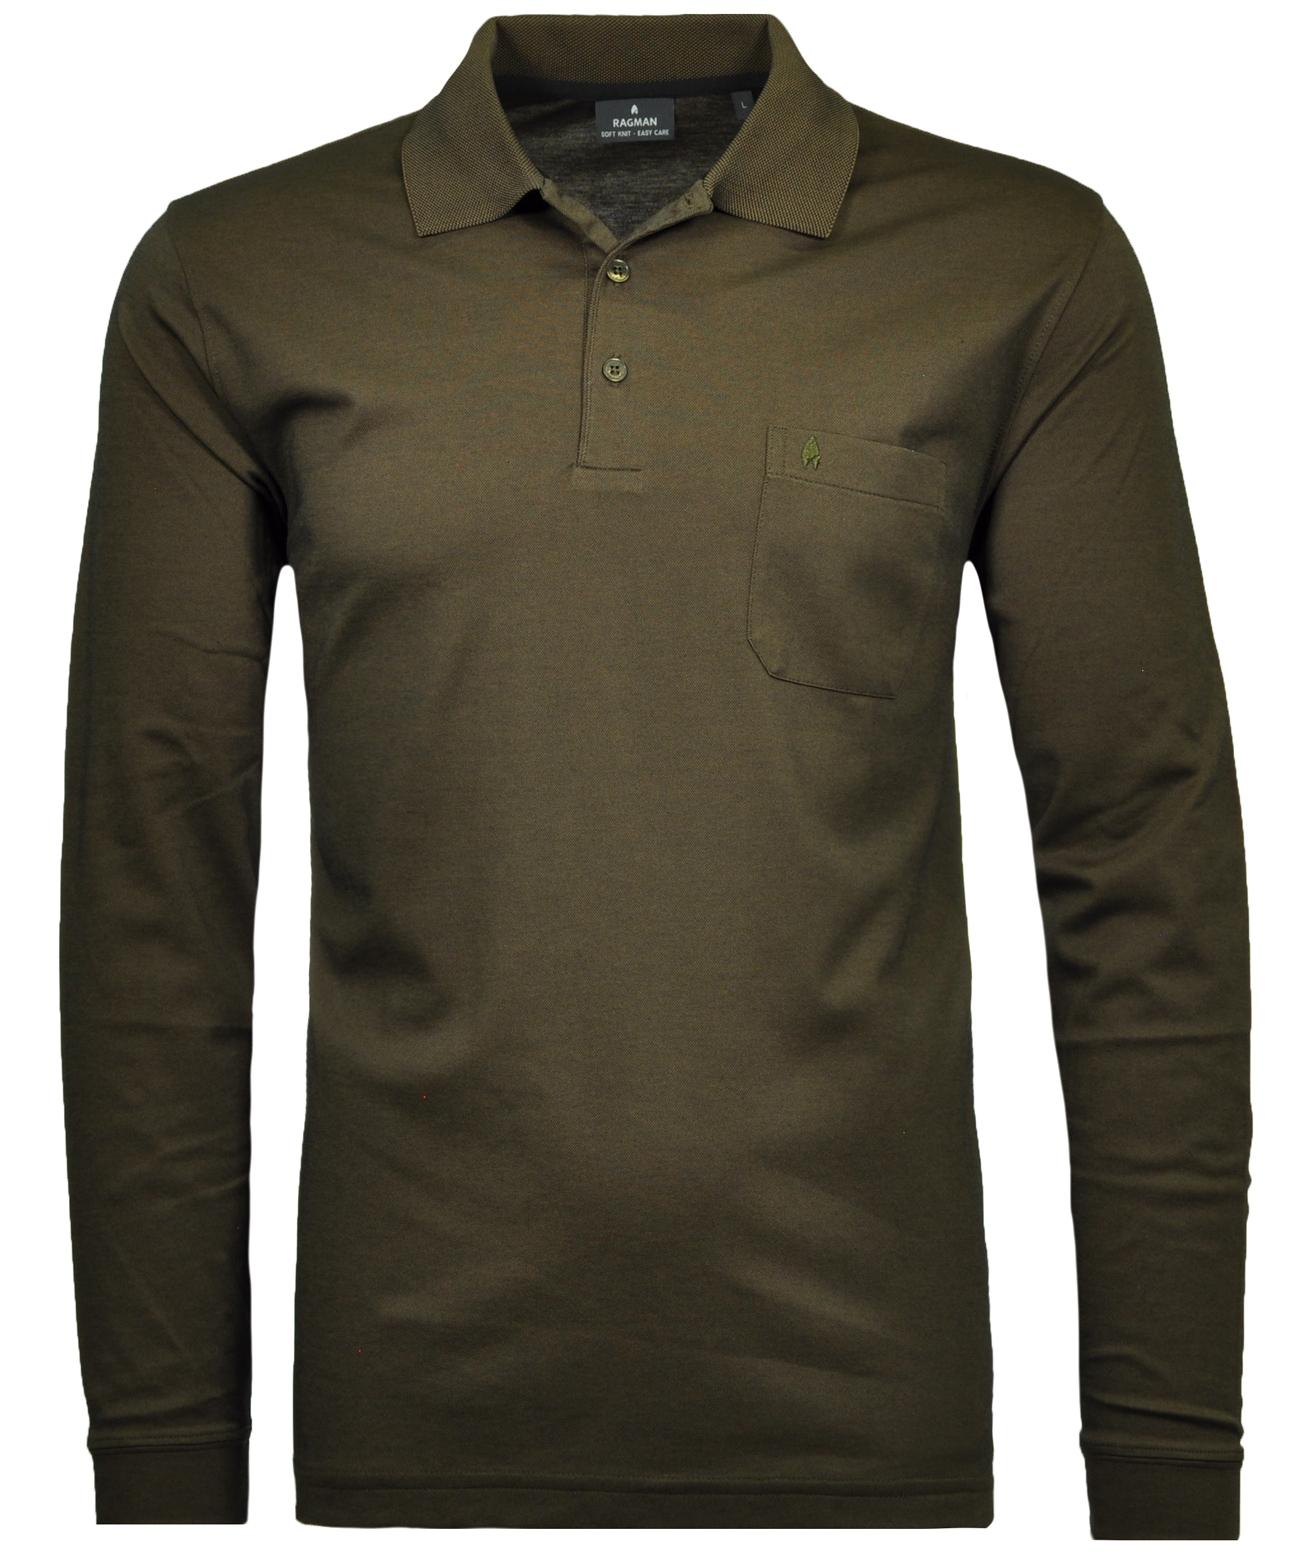 ragman -  Poloshirt